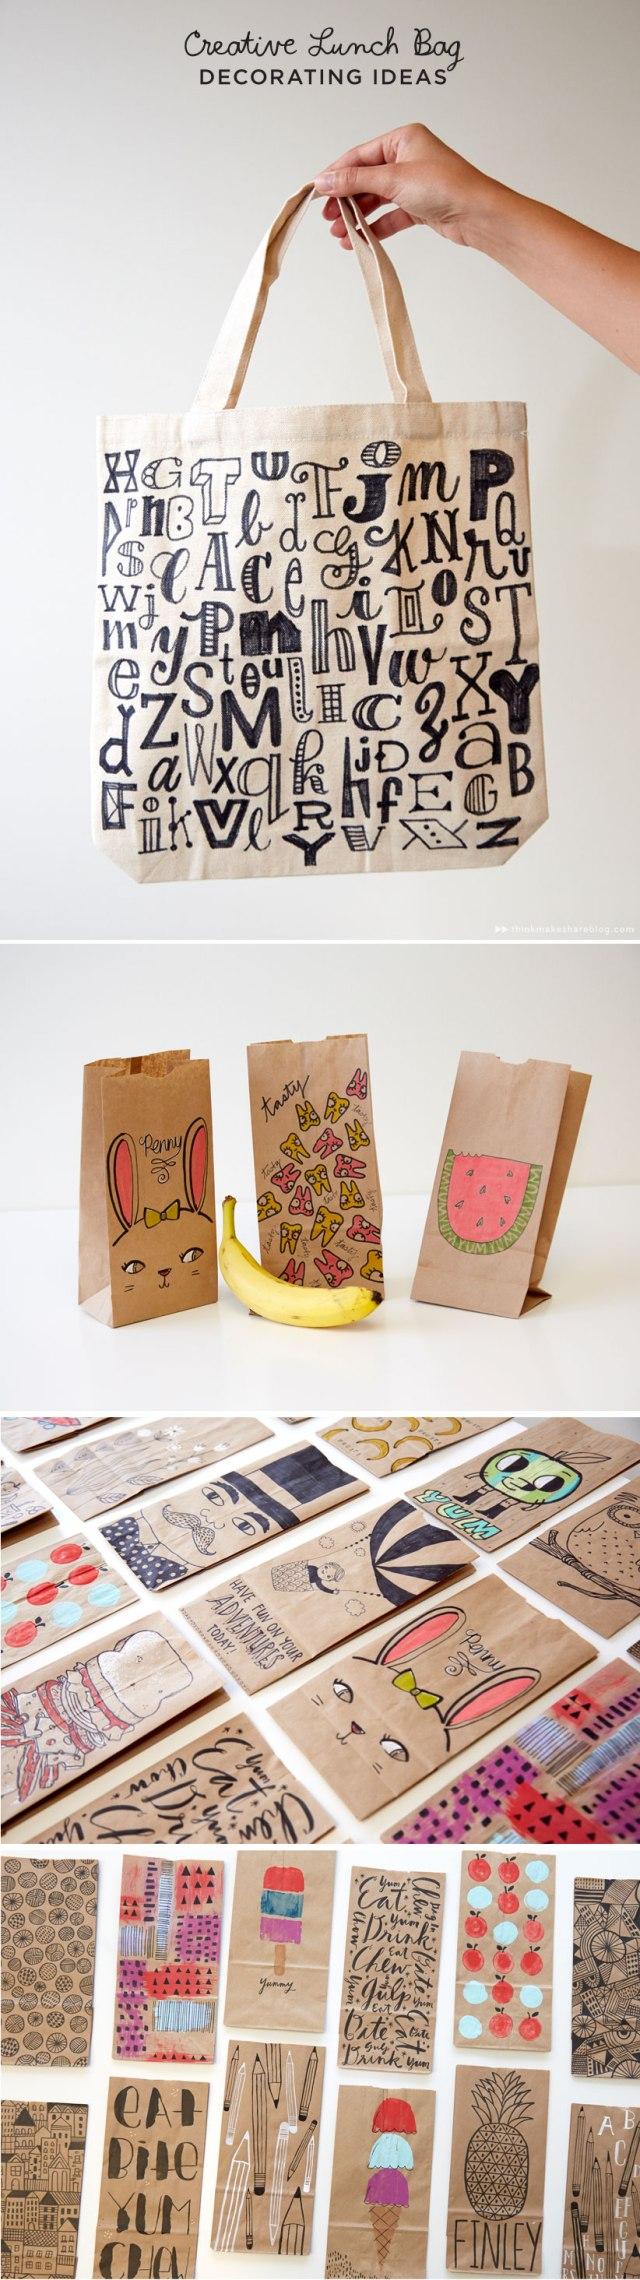 Creative Lunch Bag Decorating Ideas with Hallmark artists | thinkmakeshareblog.com